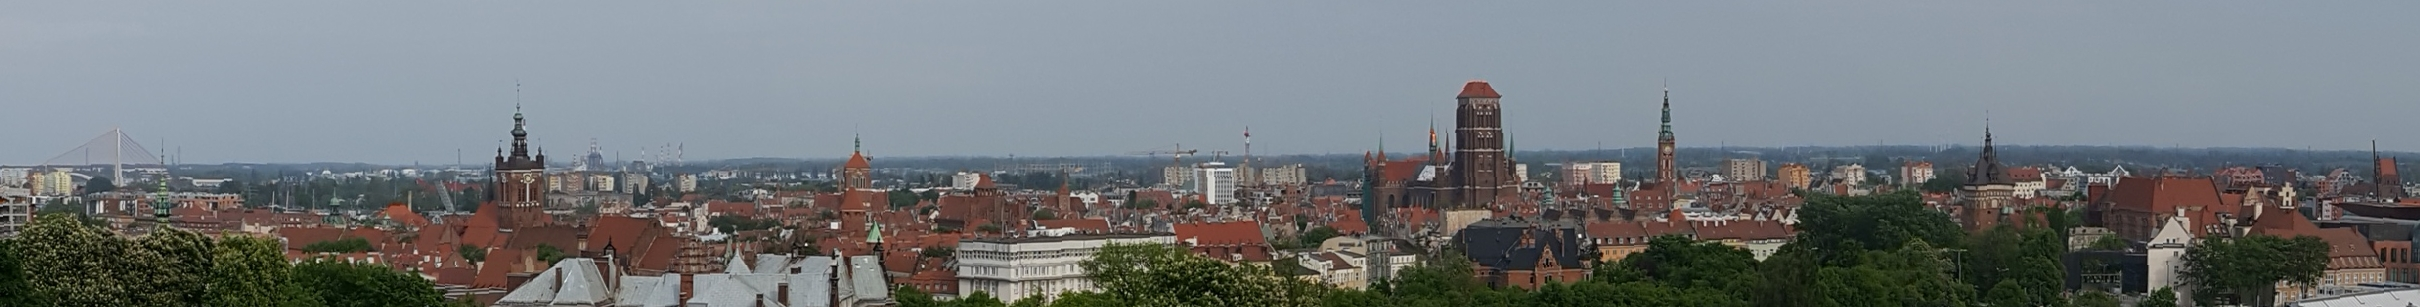 Explore Gdansk